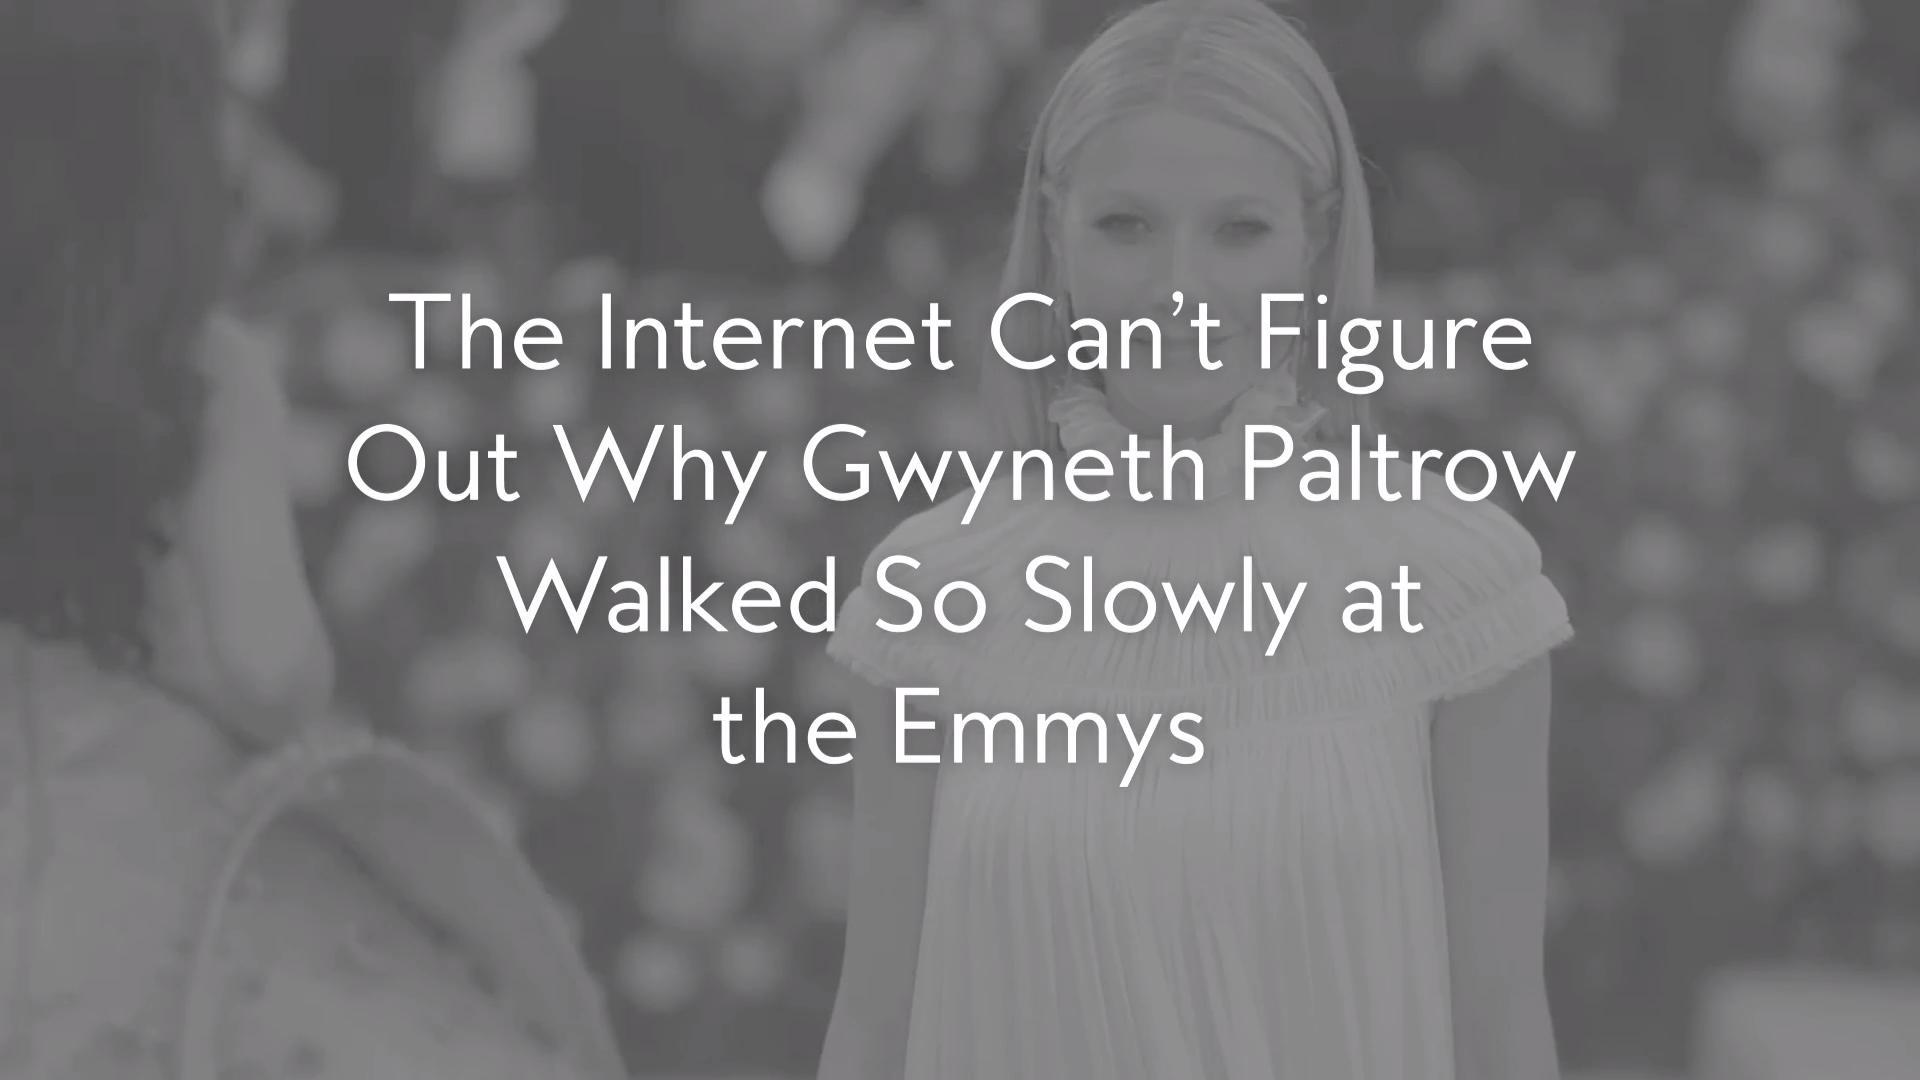 Gwyneth Paltrow's Ridiculously Silly Emmys Walk, Explained